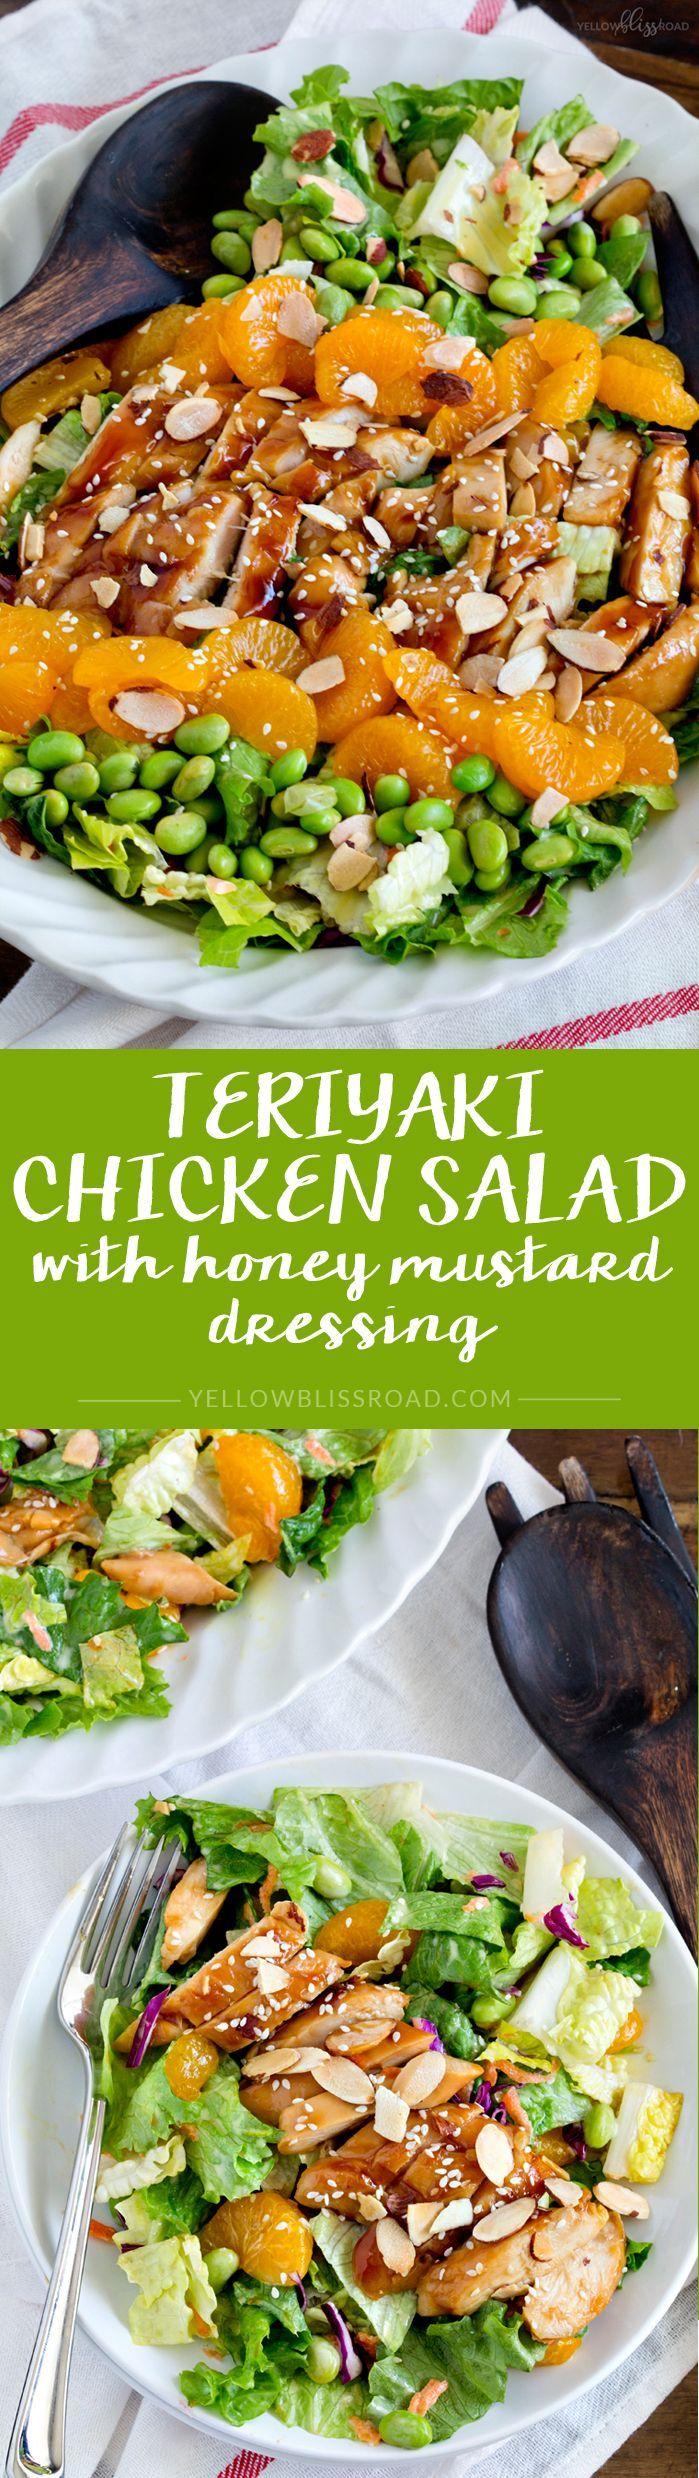 Teriyaki Chicken Salad with Honey Mustard Dressing - Red Robin Banzai Salad Copycat